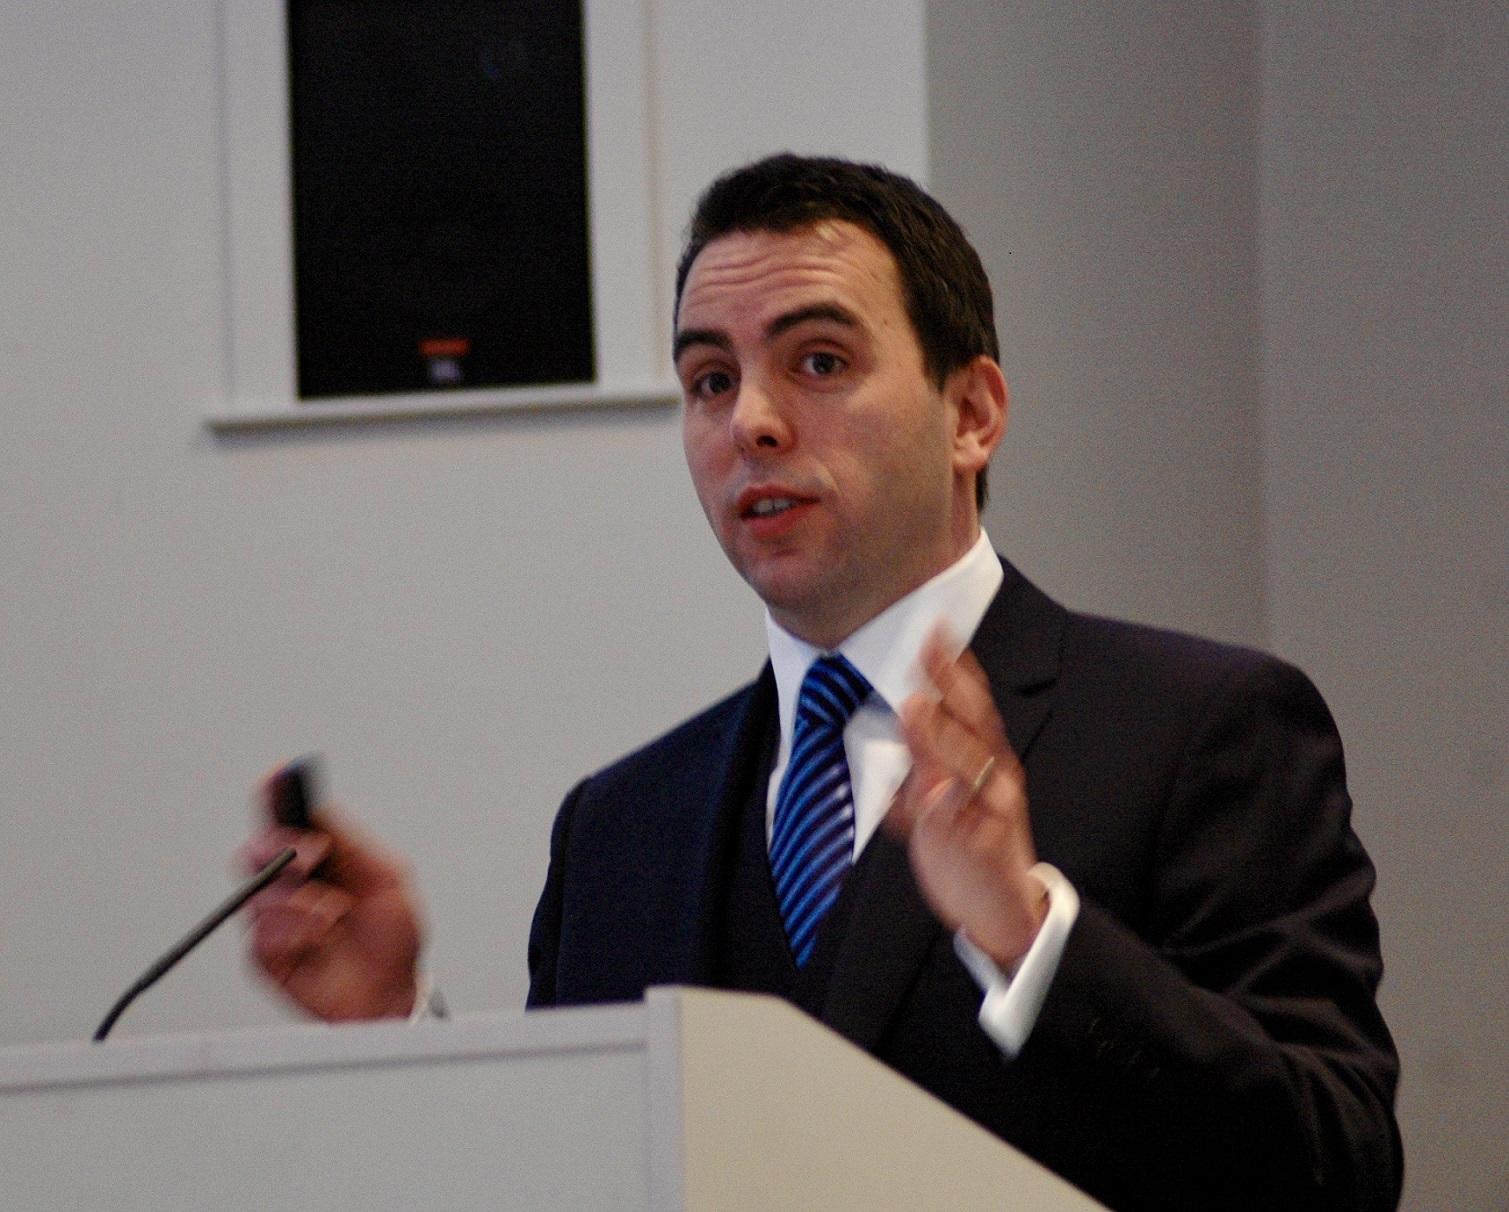 Shadow Environment Secretary Calls For More Action On Circular Economy At ADBA Scottish Conference